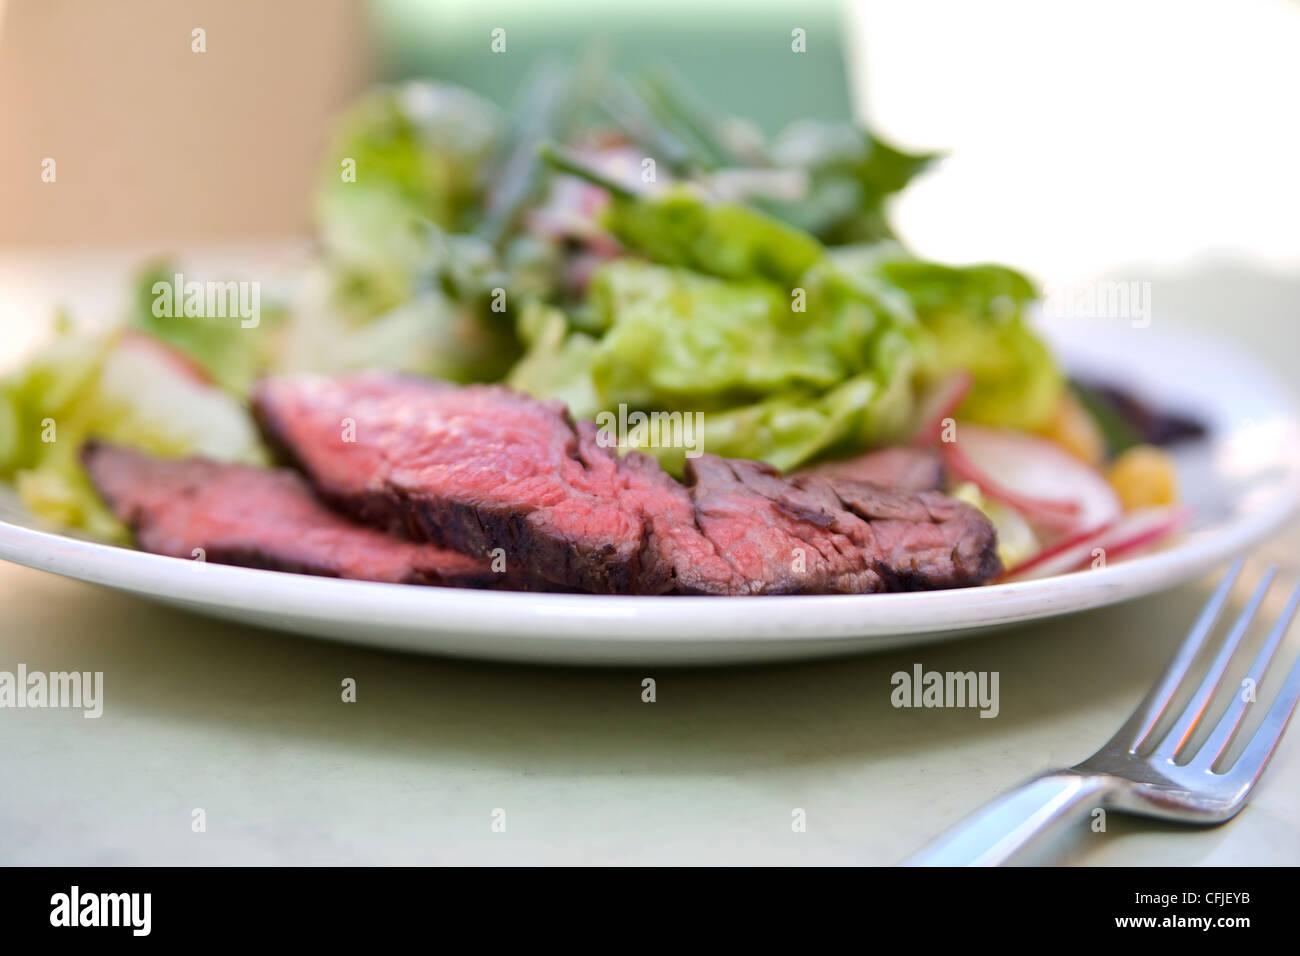 Sliced strip steak salad - Stock Image